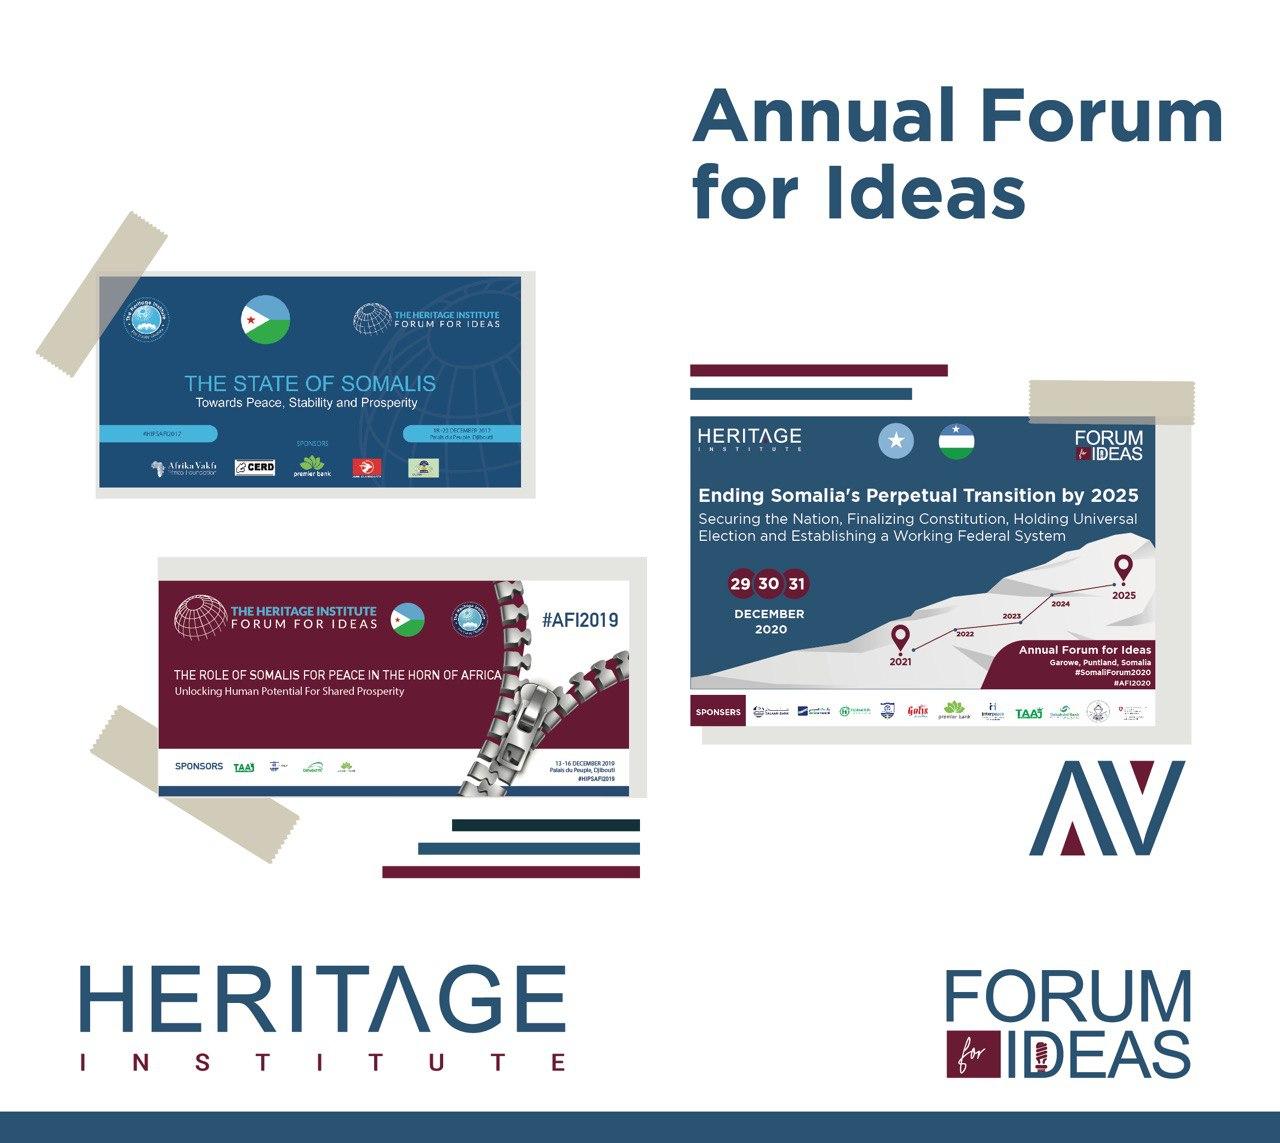 Annual Forum for Ideas